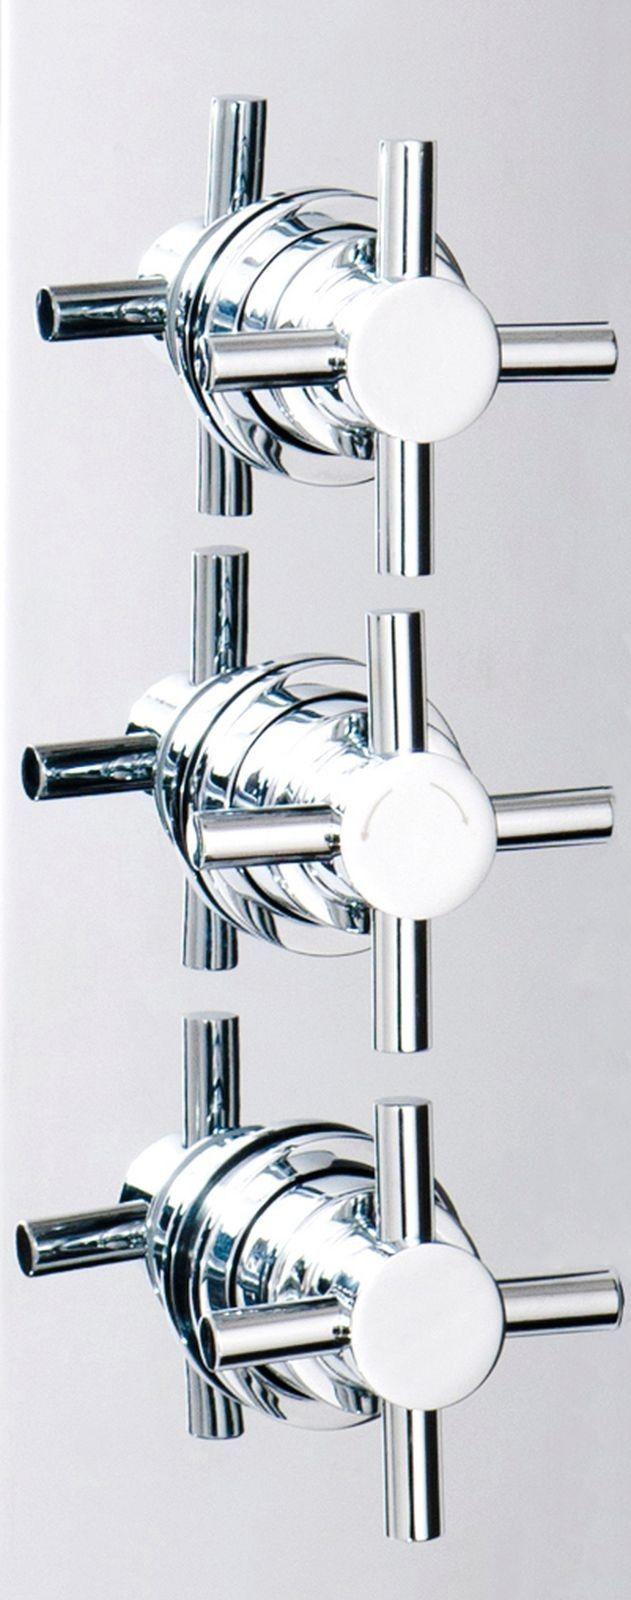 14 best Shower Valves images on Pinterest | Shower valve, Showers ...